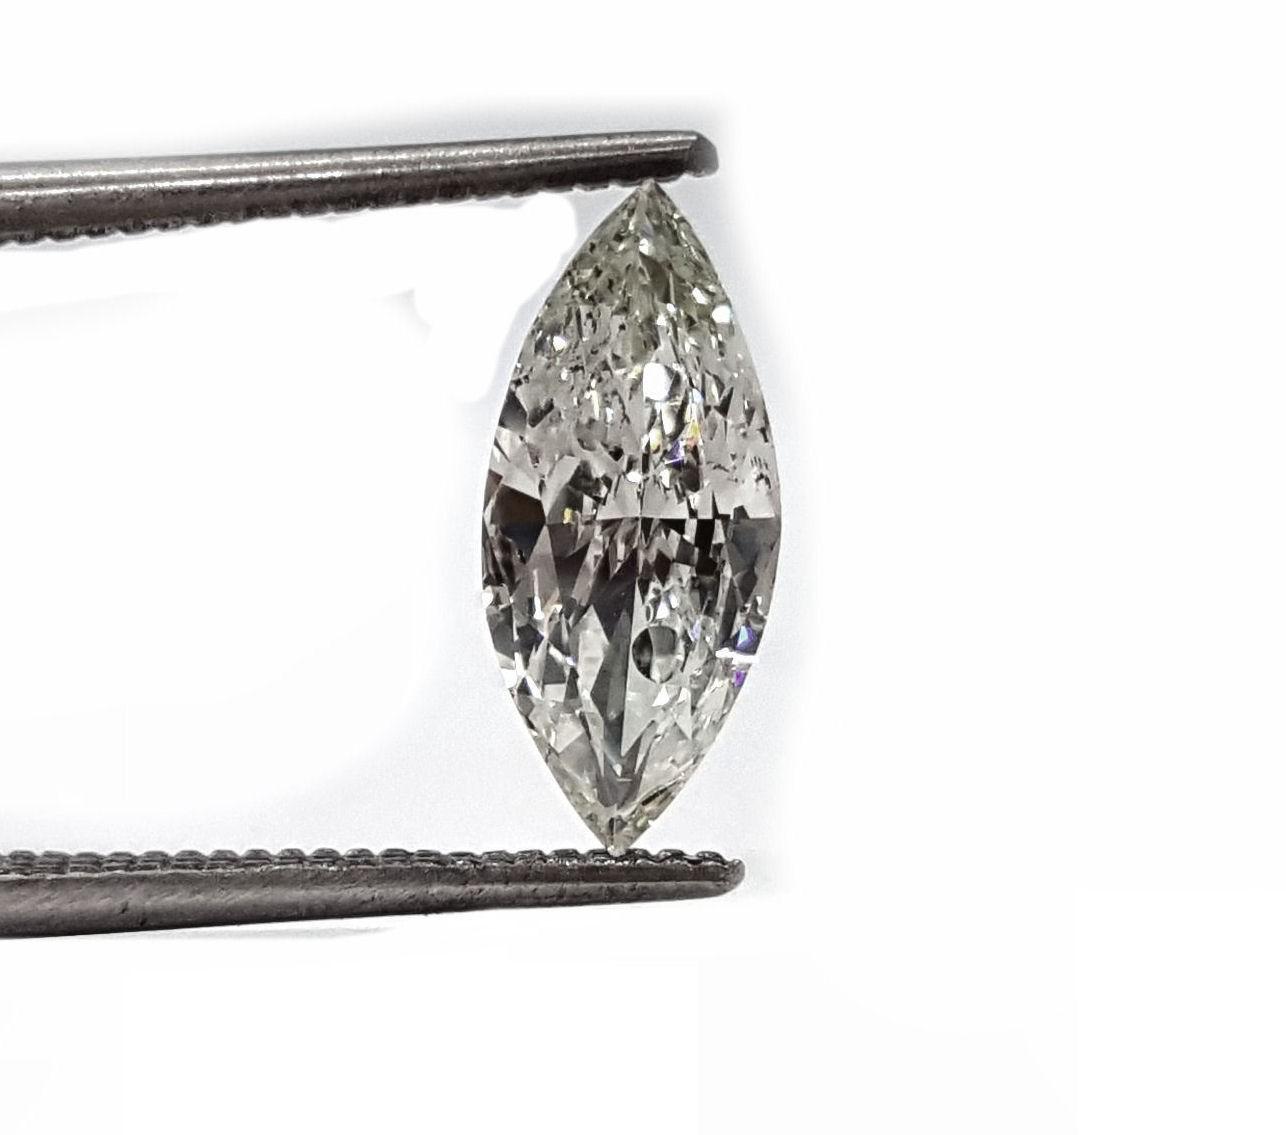 1.17ct. marquise diamond J SI2 quality